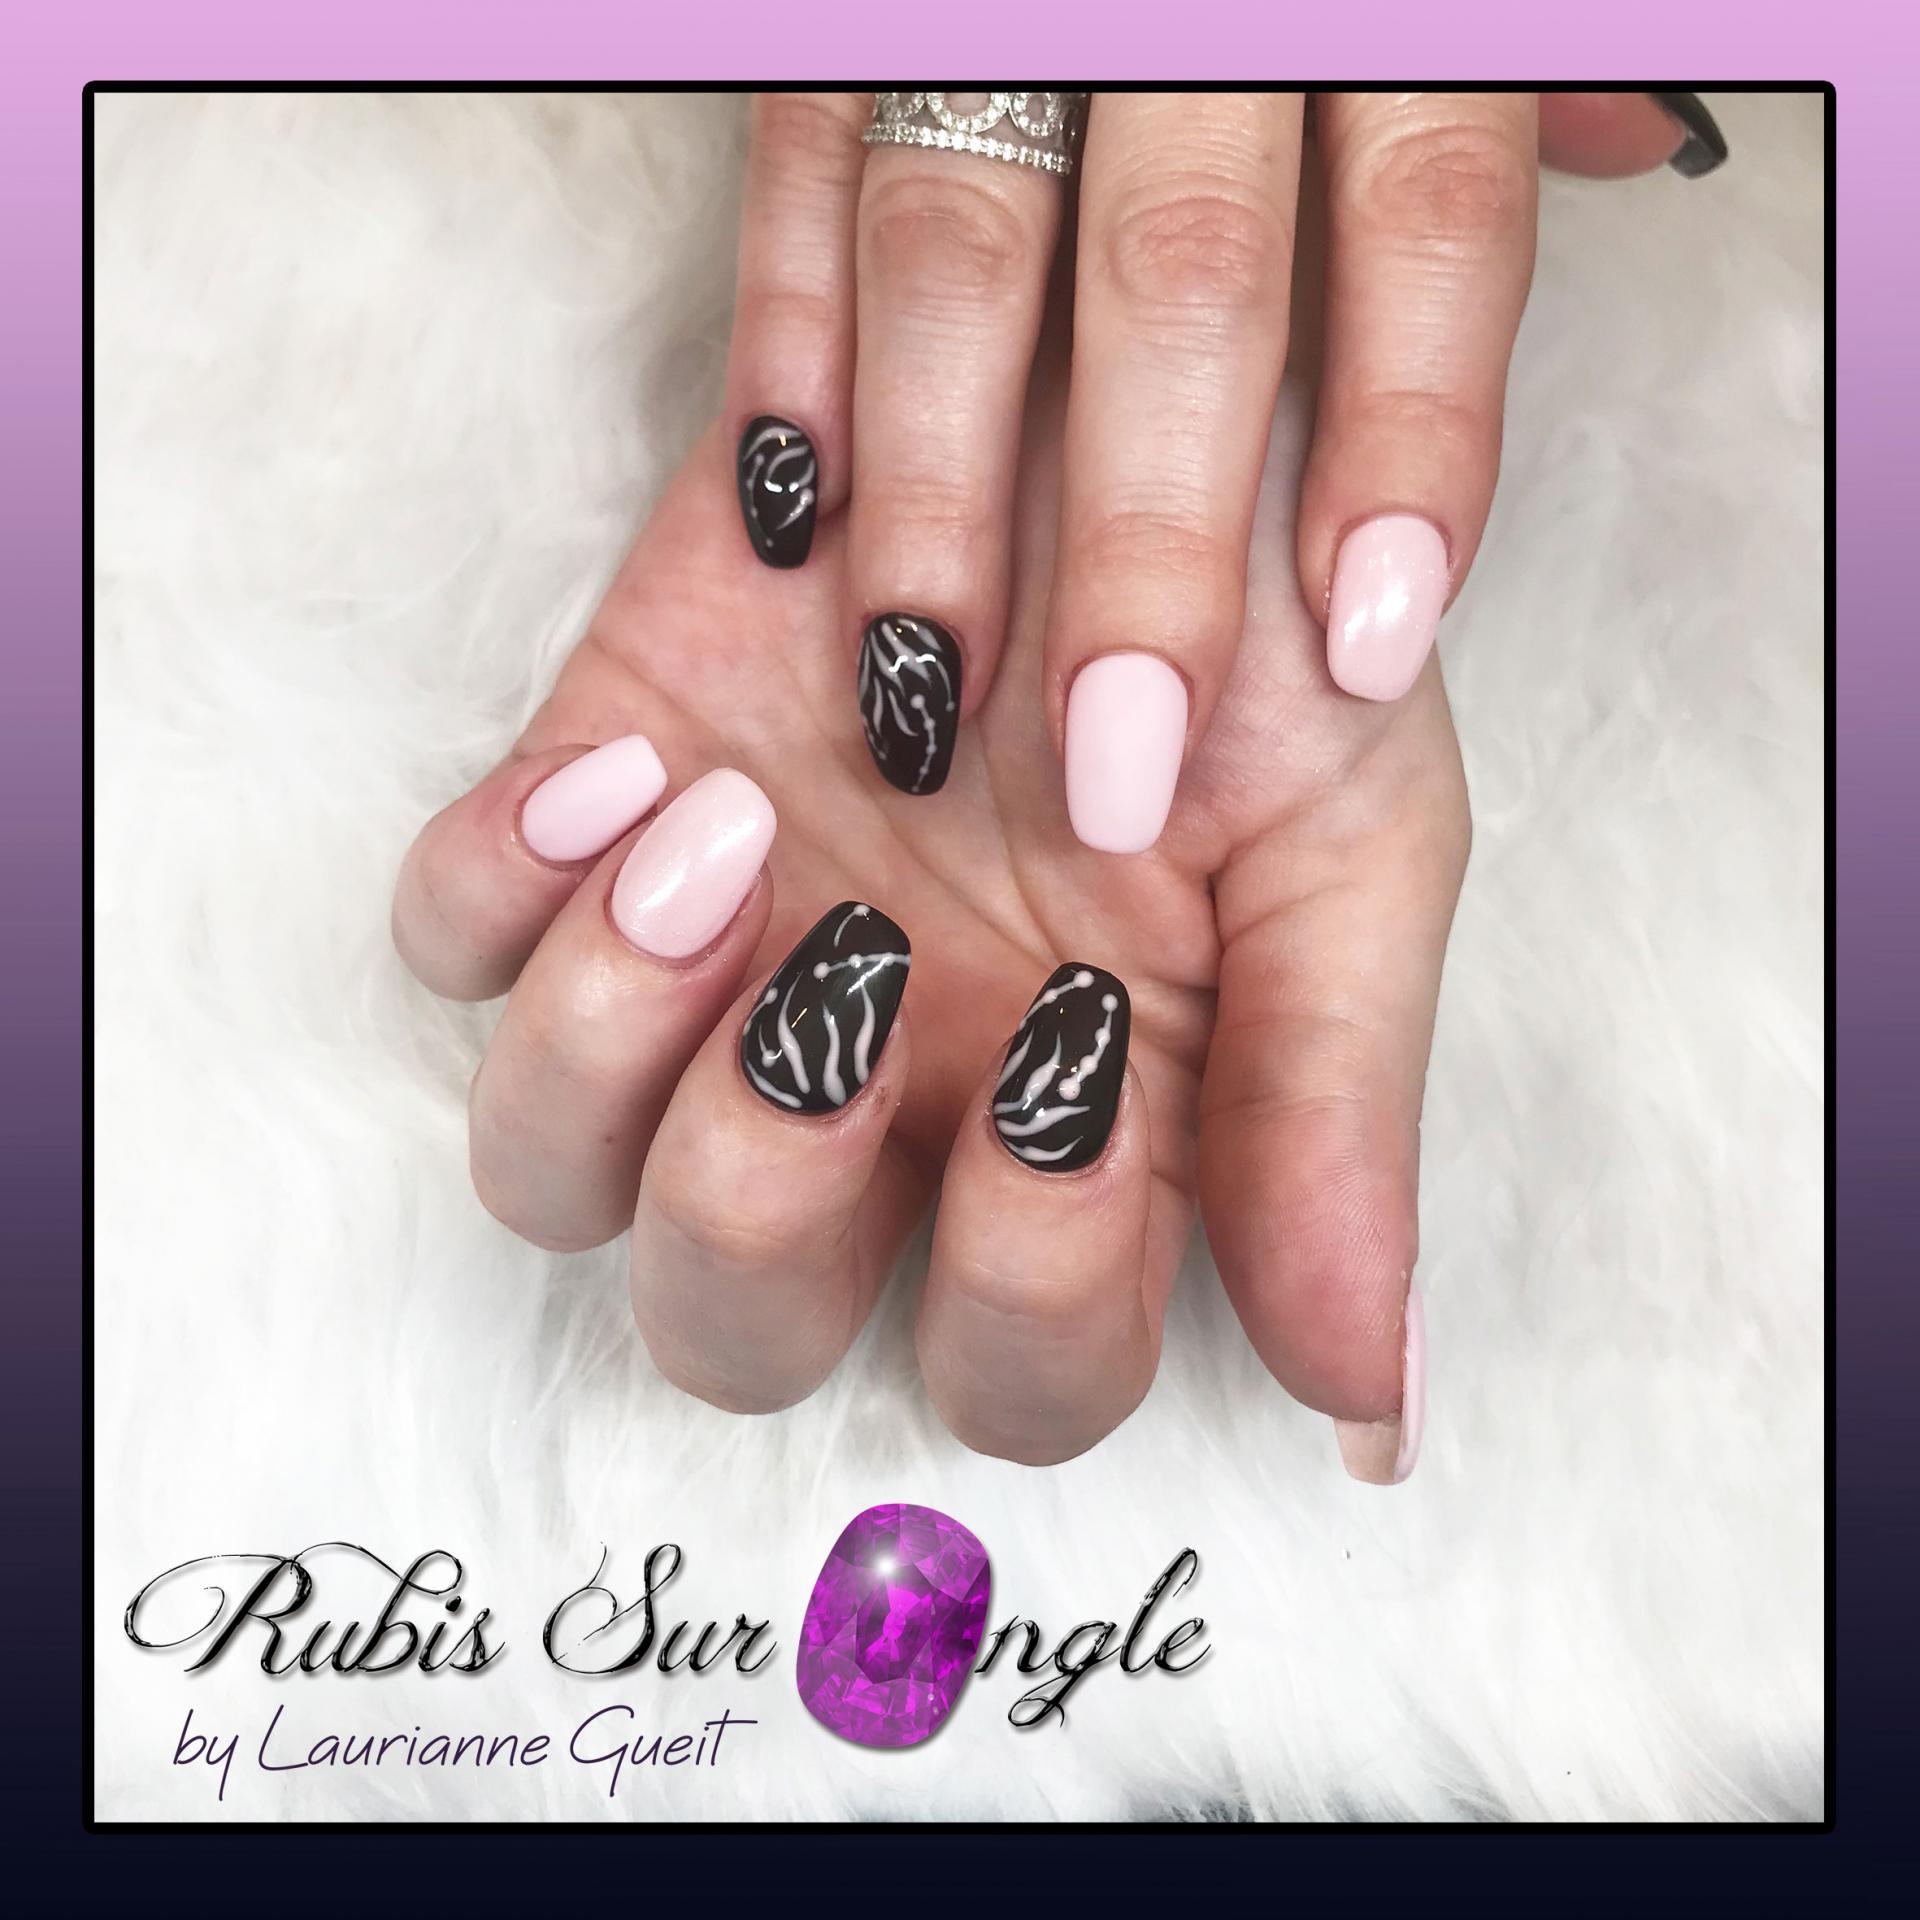 Rubis Sur Ongle Manucure Nail Art